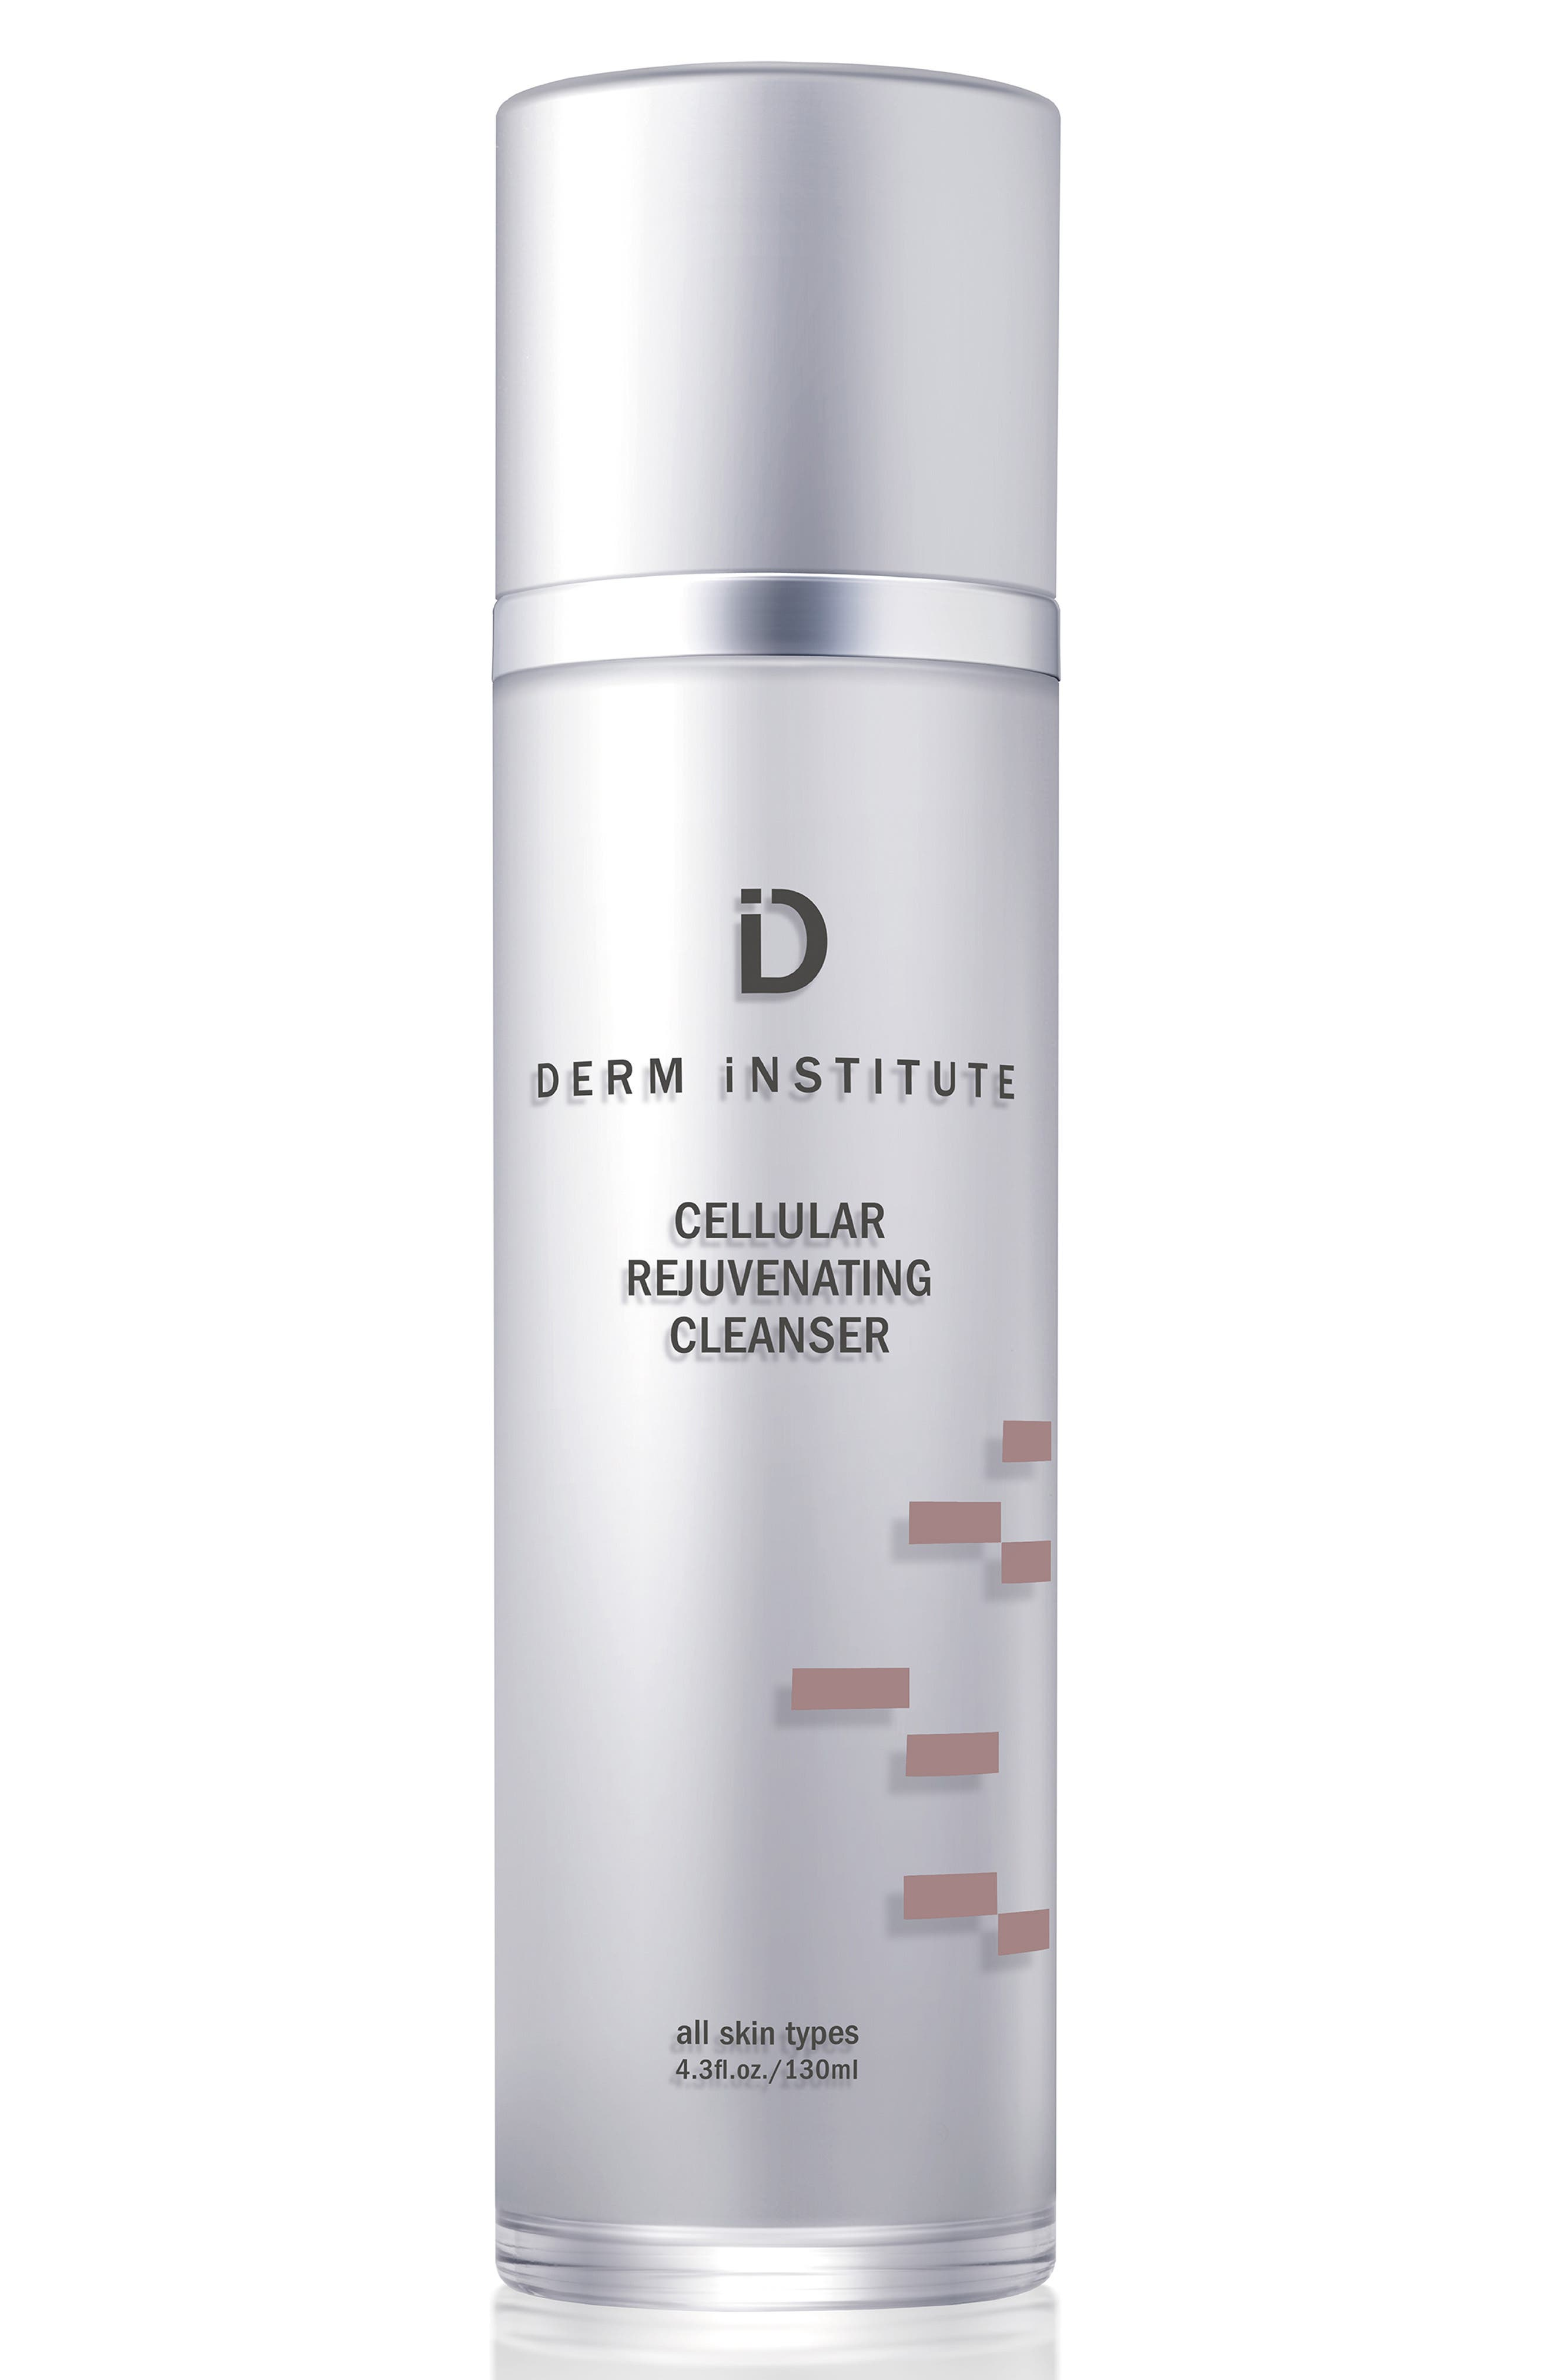 Cellular Rejuvenating Cleanser & Muslin Cloth